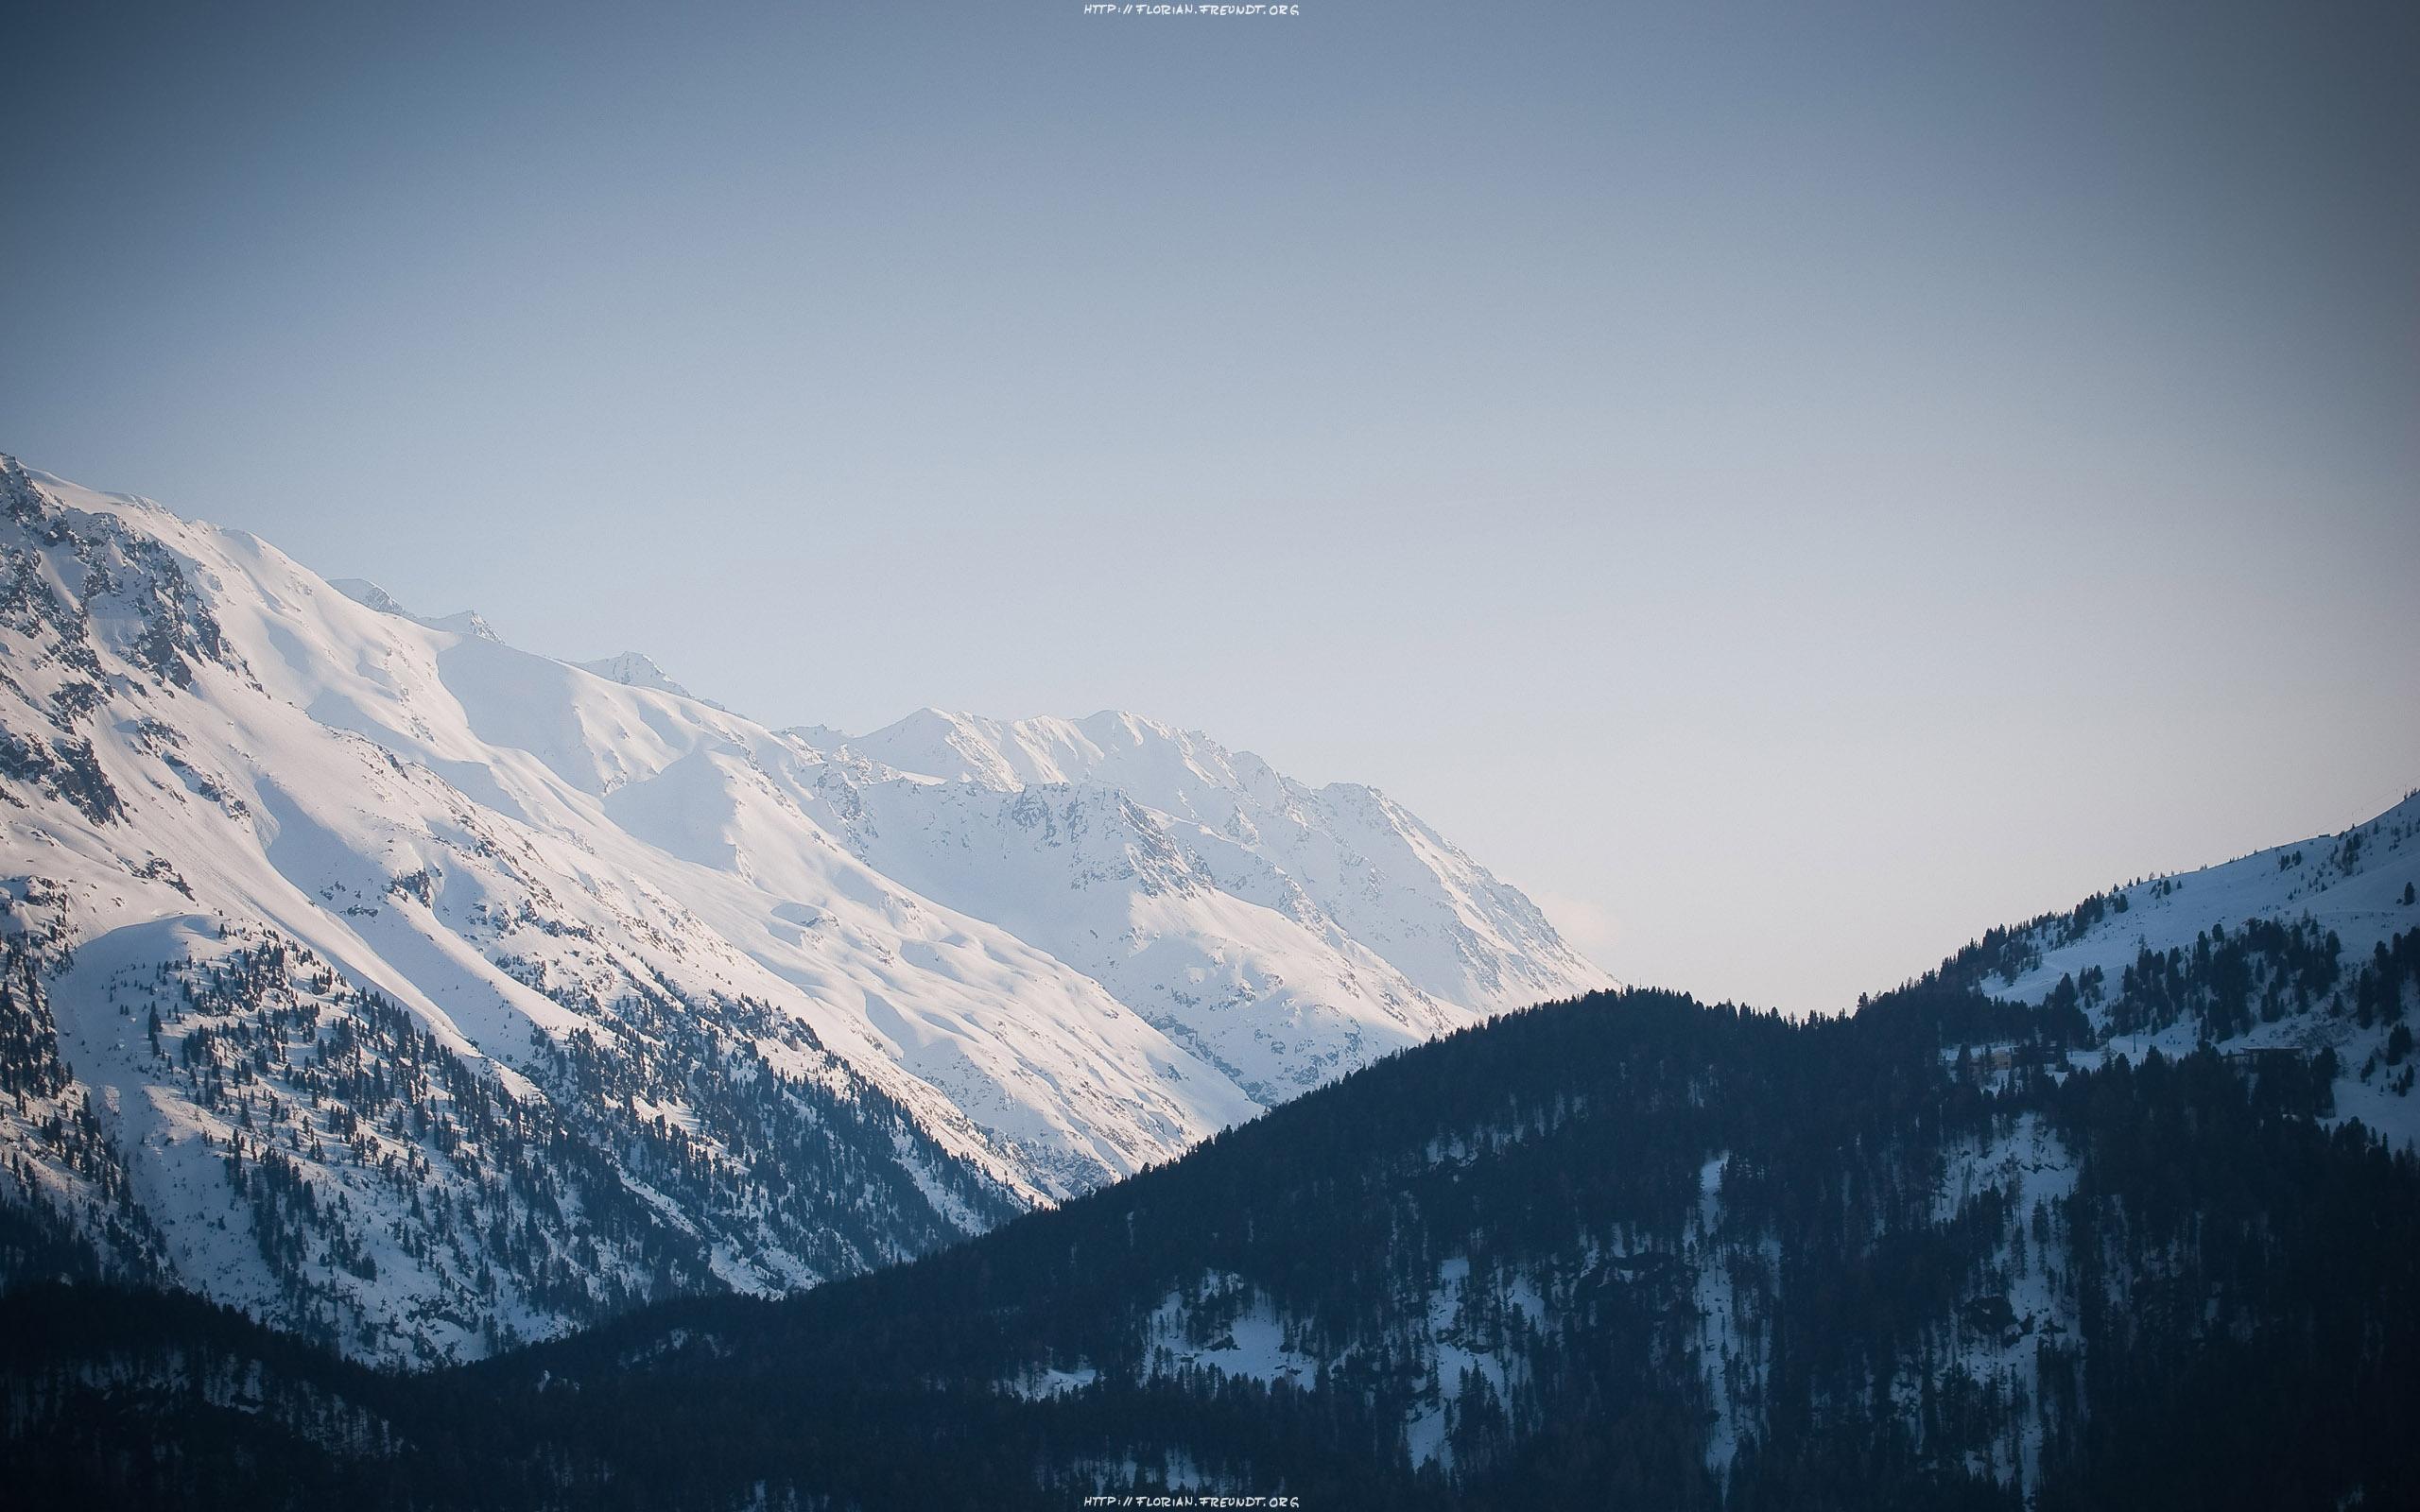 Hd Wide Mountain Desktop Pc And Mac Wallpaper - Mountain Desktop , HD Wallpaper & Backgrounds